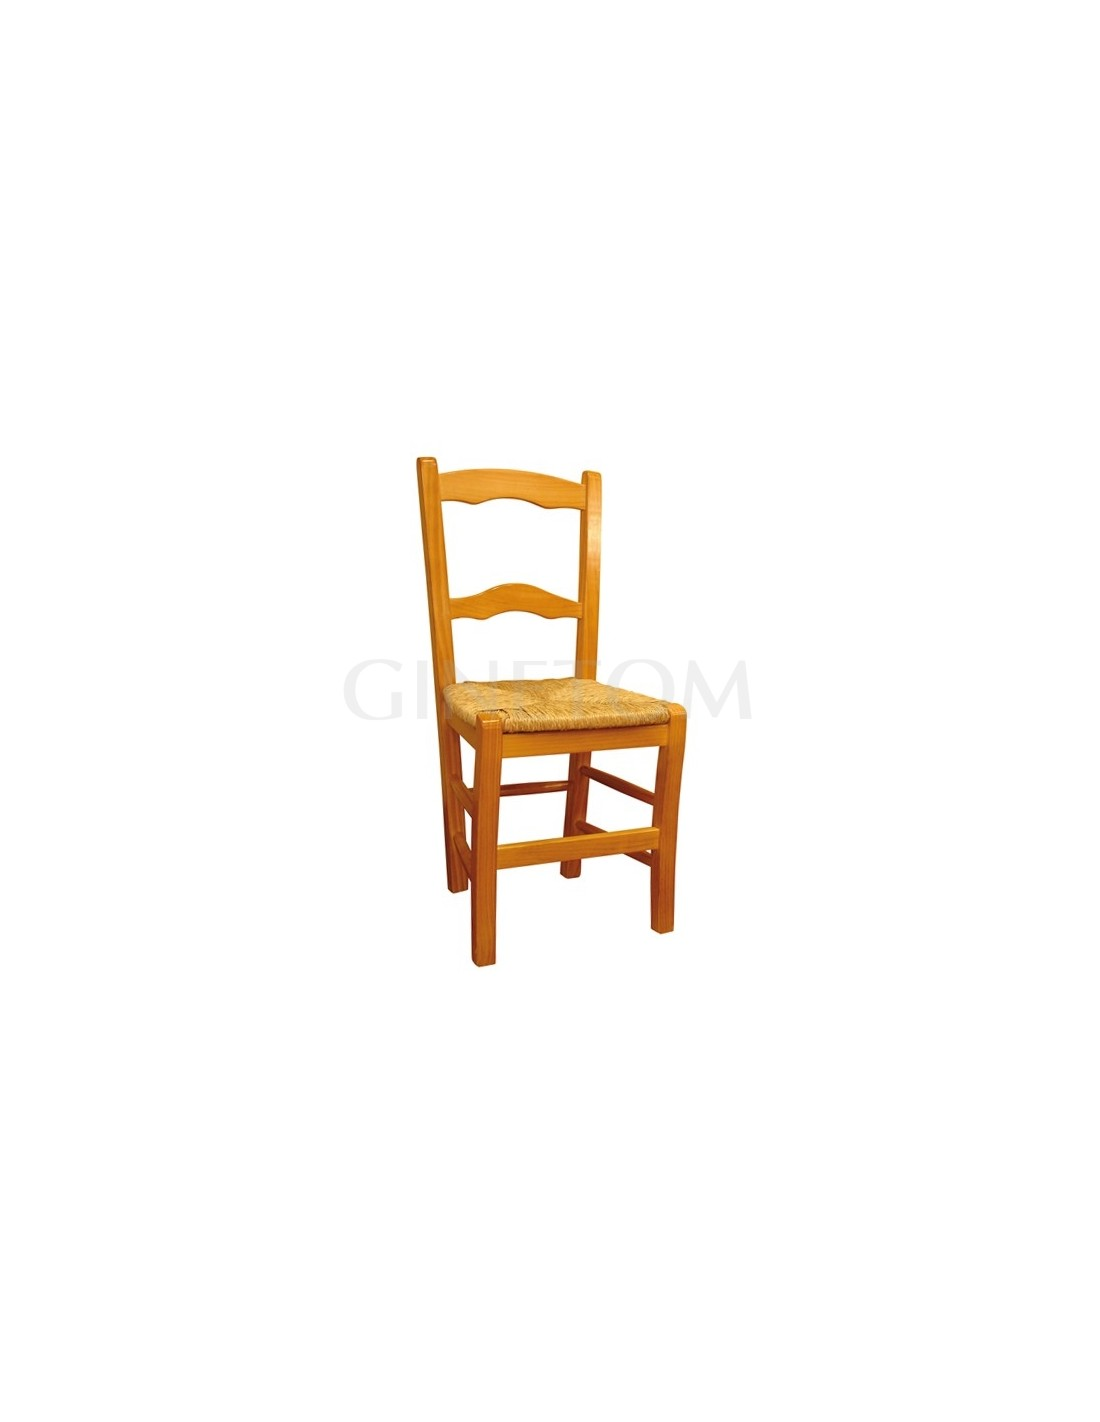 Sillas de madera ref 240 sillas hosteler a de ginetom for Sillas hosteleria